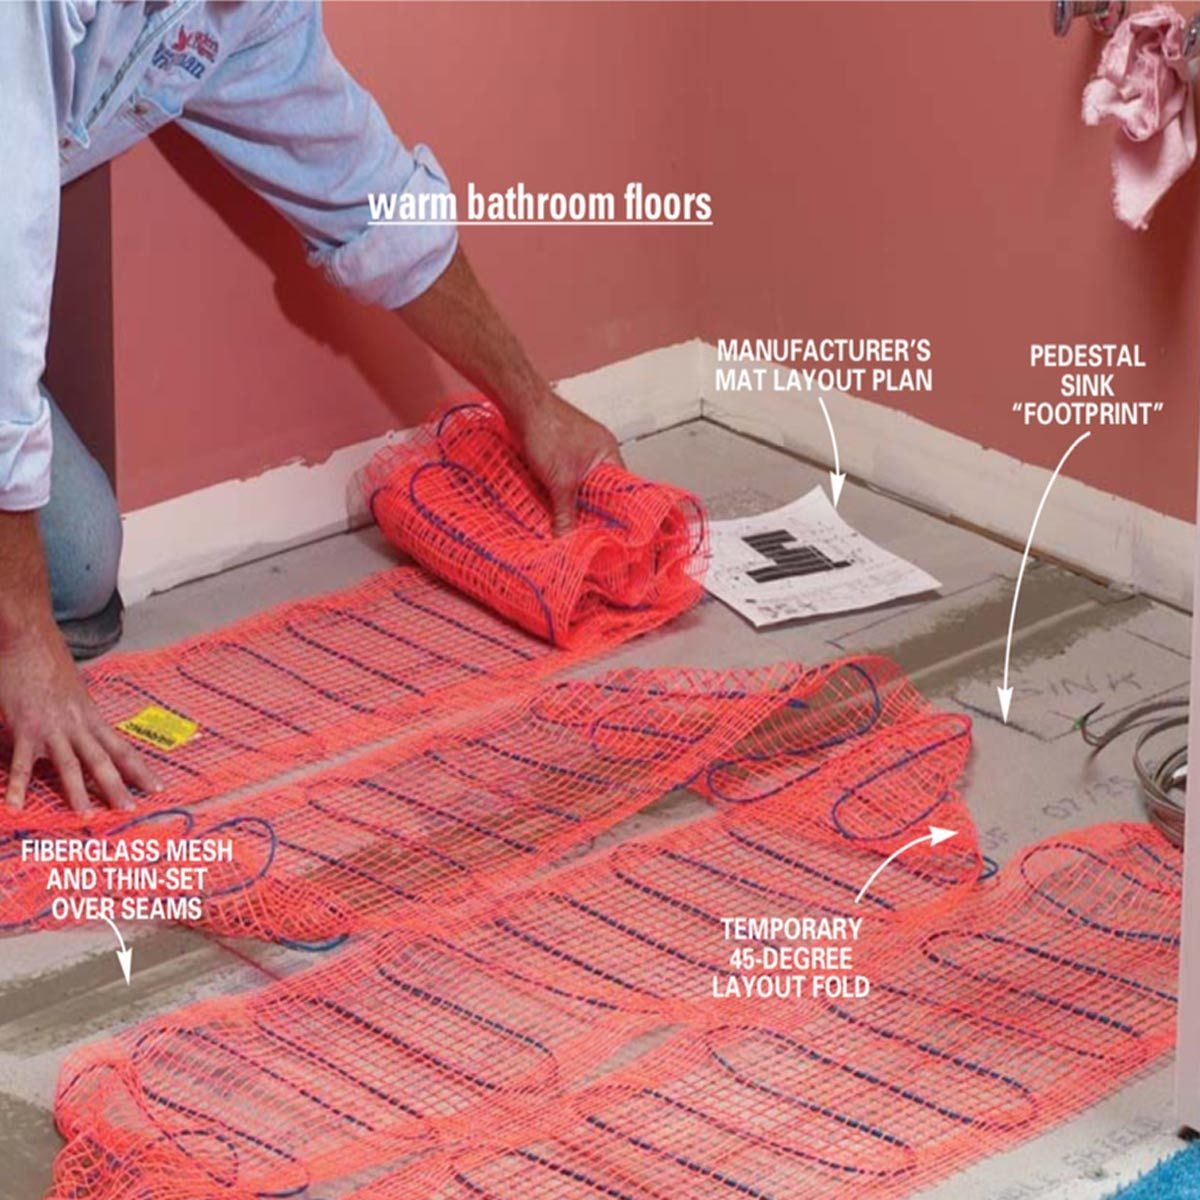 How To Install In Floor Heat Radiant